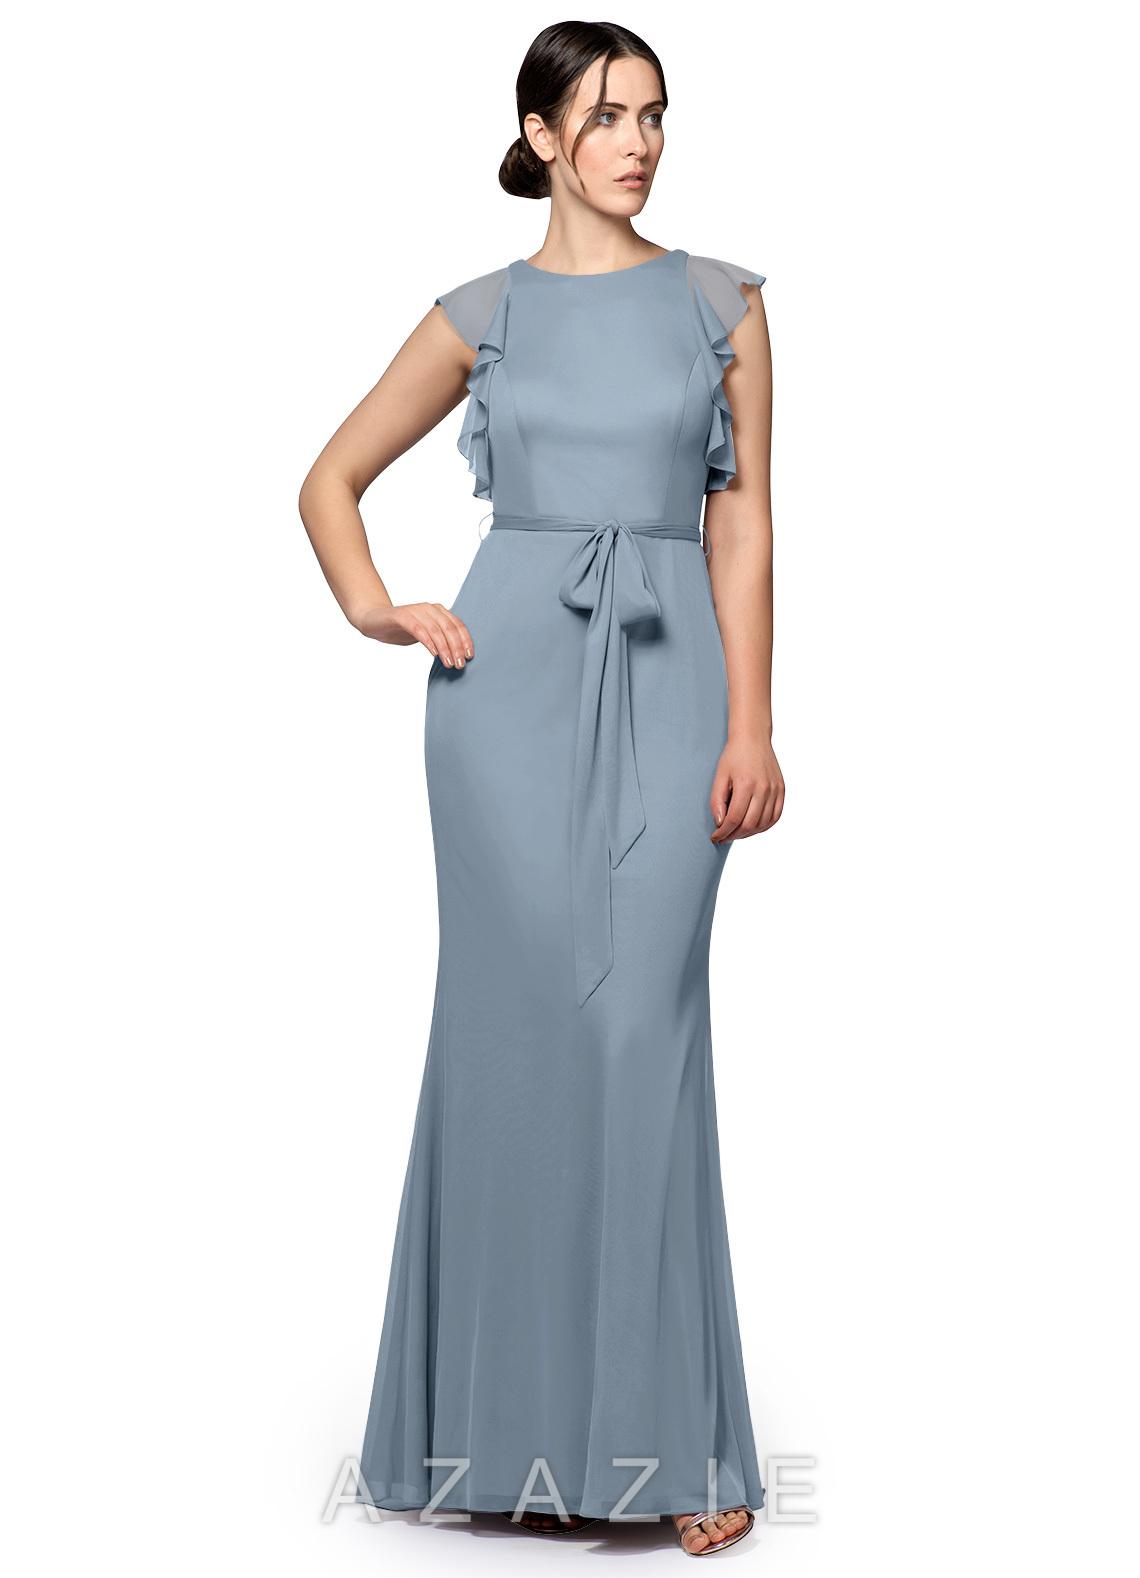 481b2c9307f Azazie Bryony Bridesmaid Dress